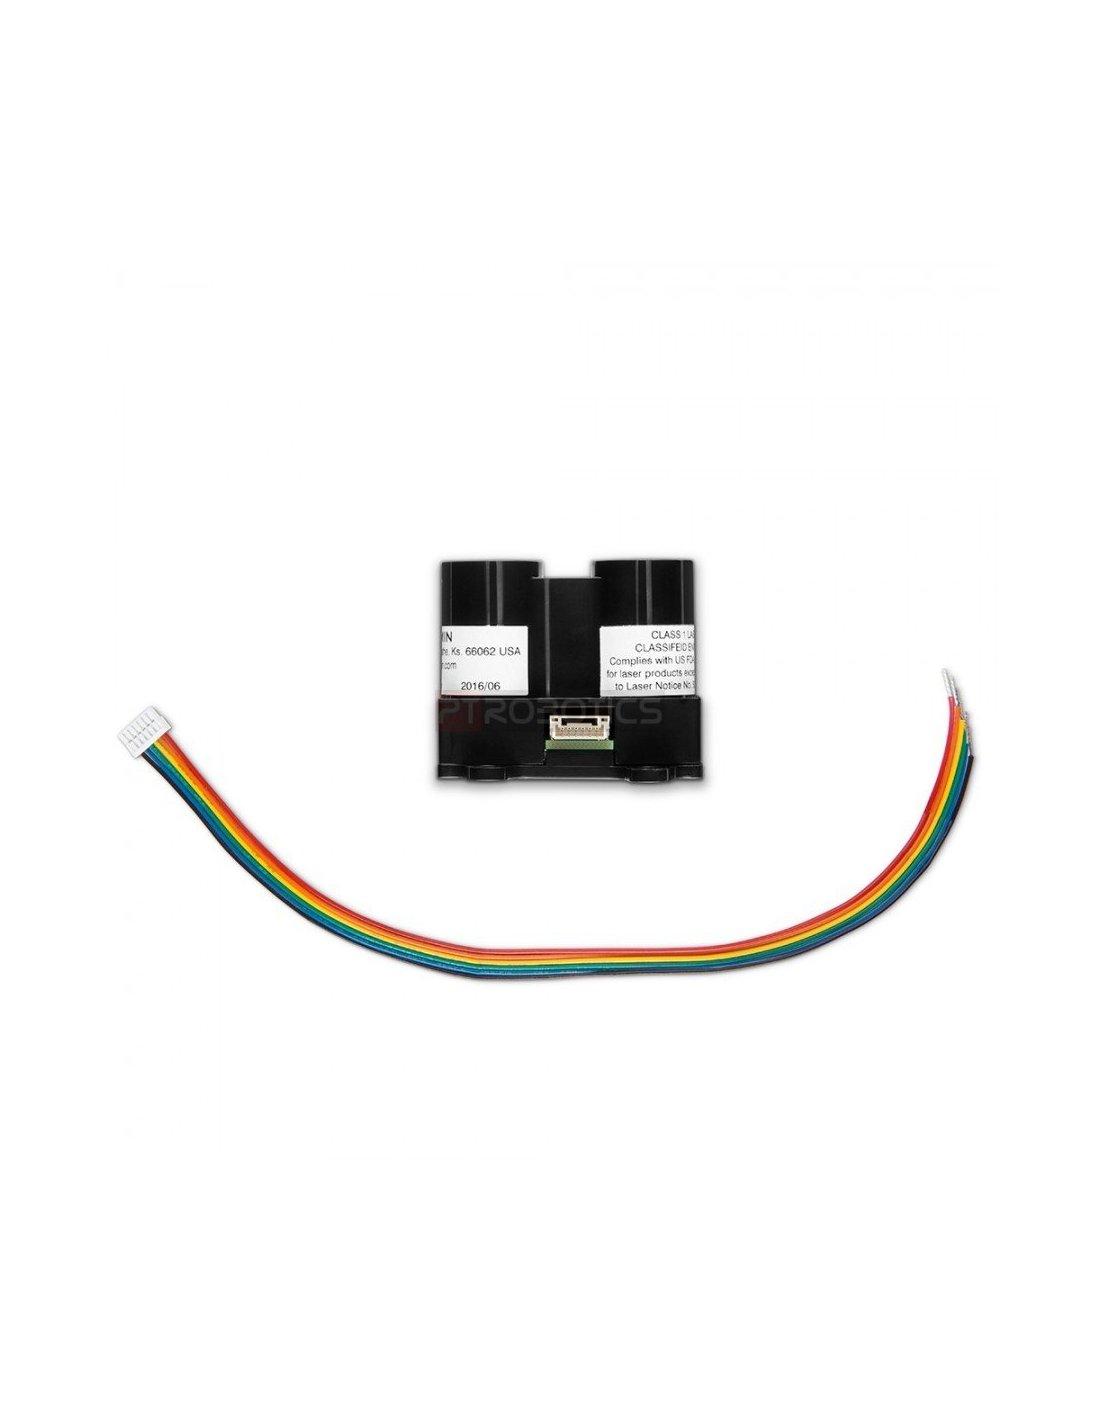 LIDAR Lite - LRF 40 meter - shopsumeetinstrumentscom